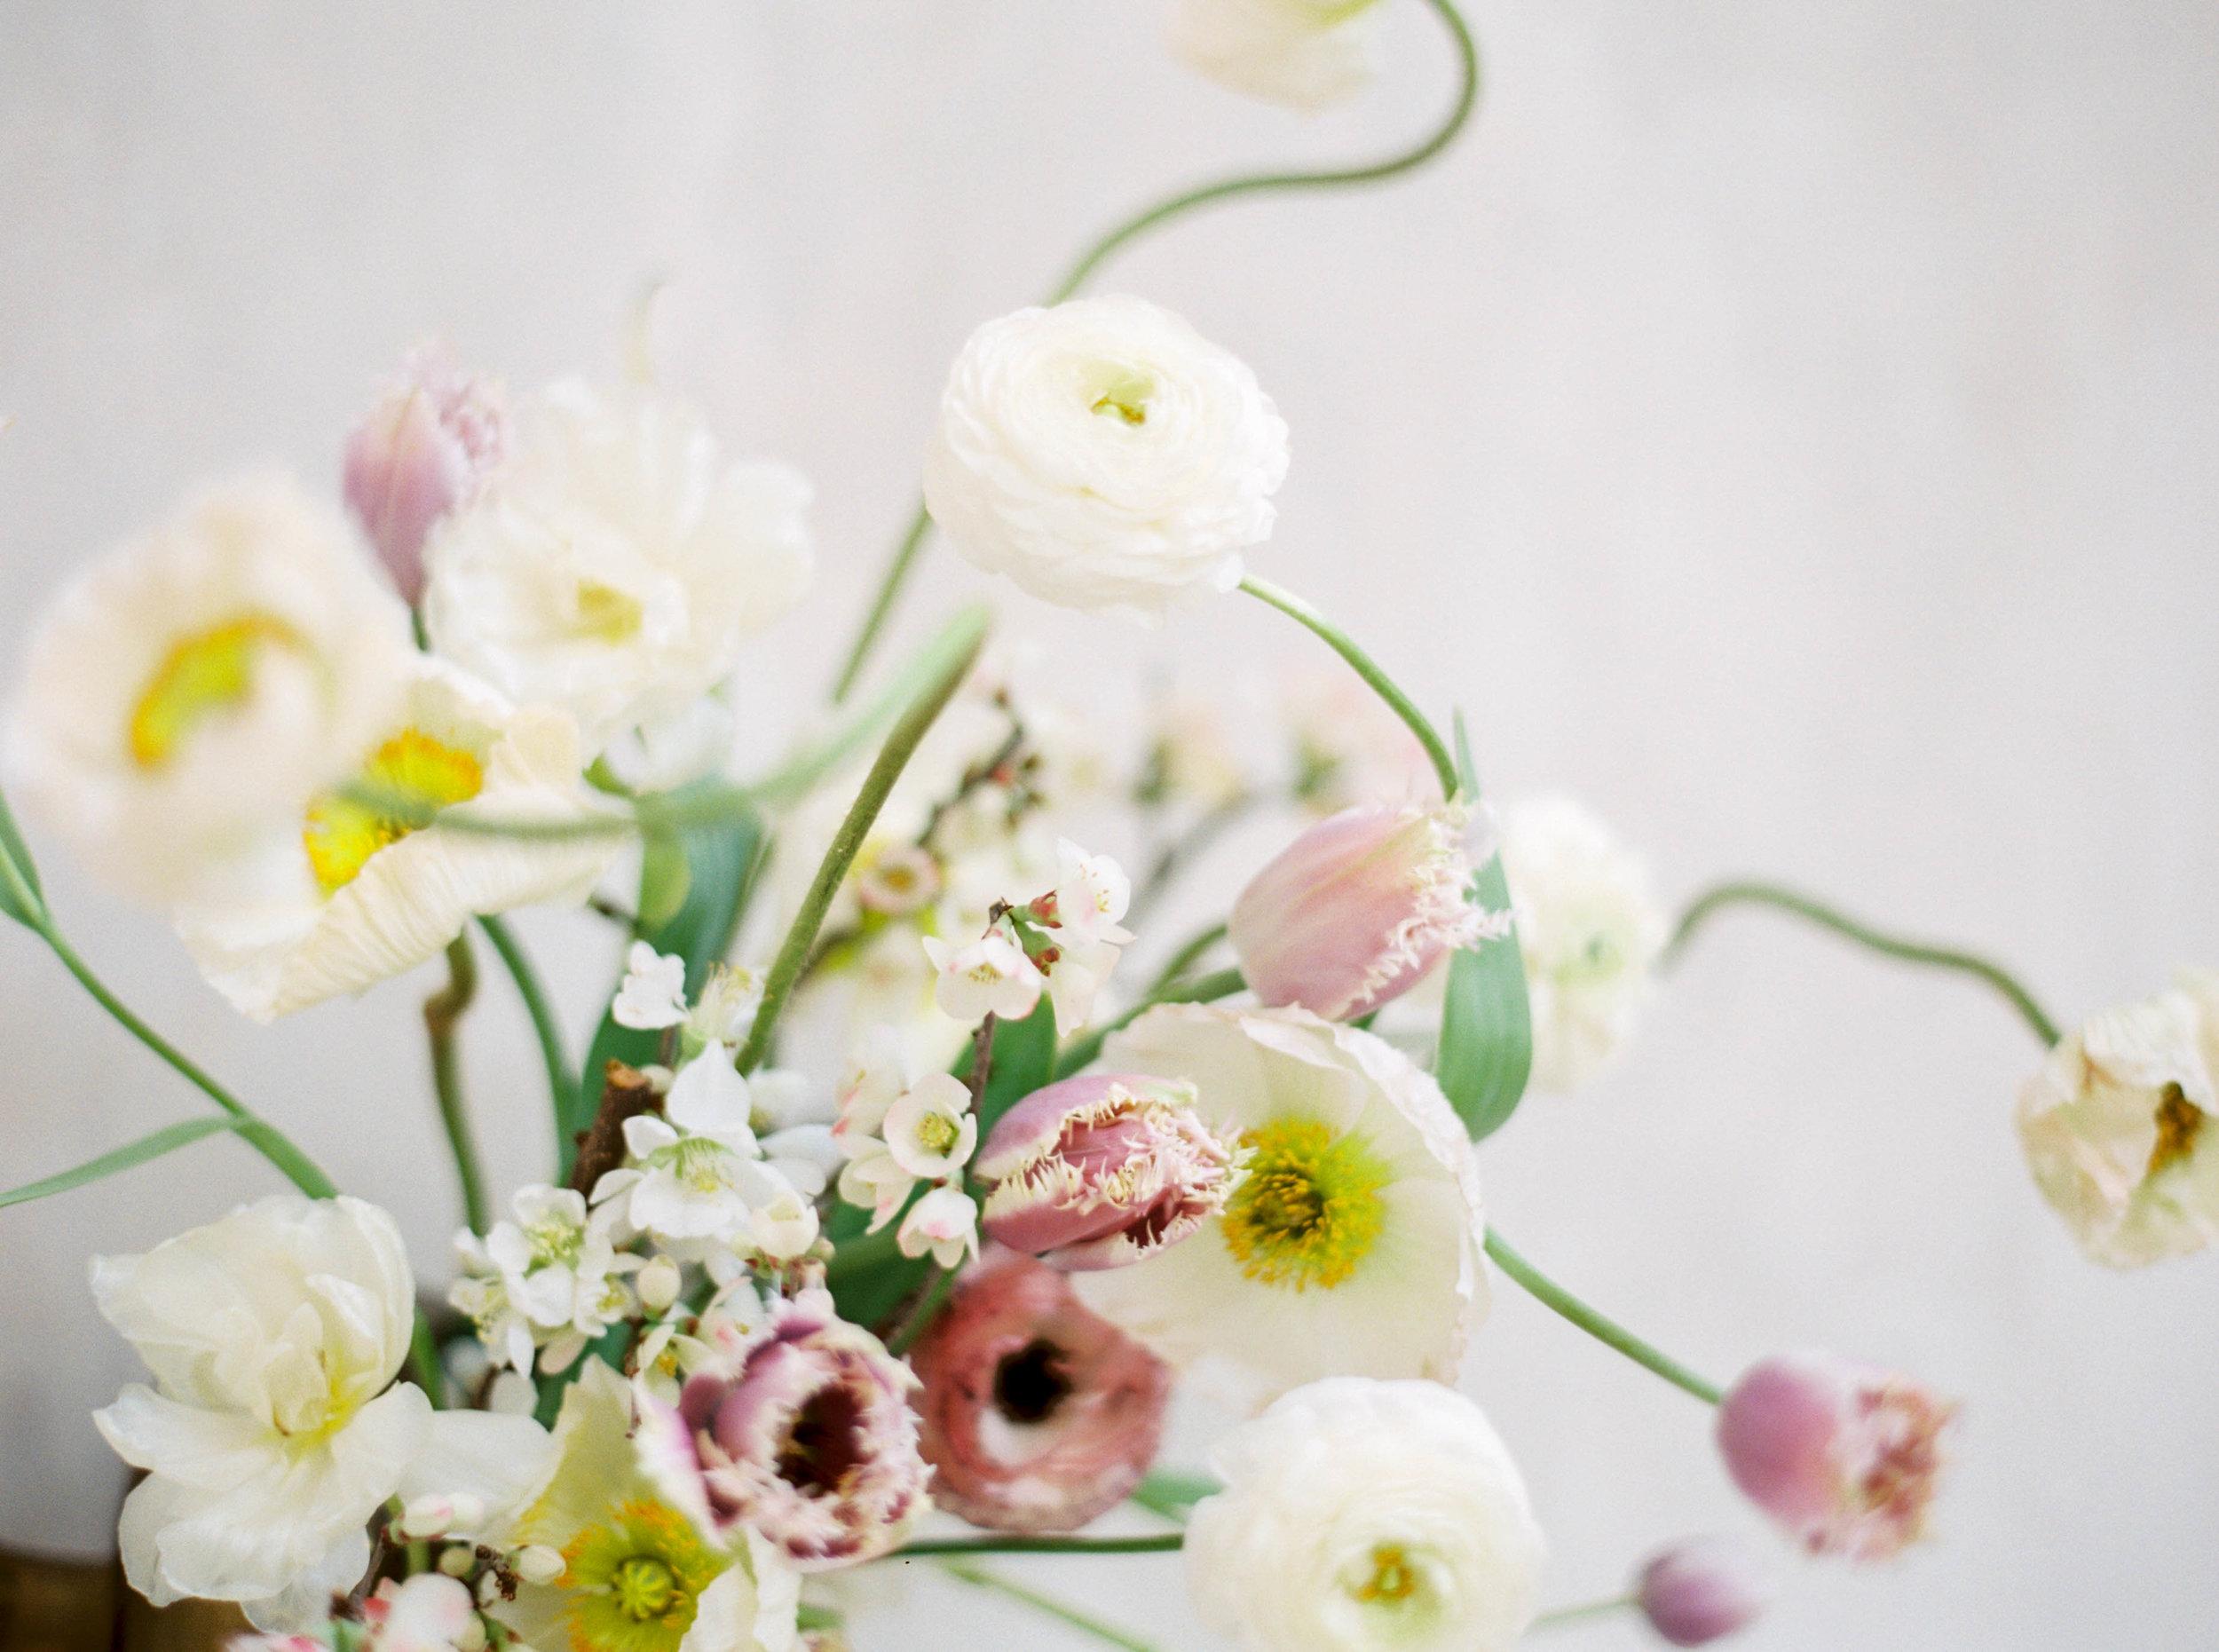 Evergreen-boop-Jenna-Powers-Photography-9.jpg